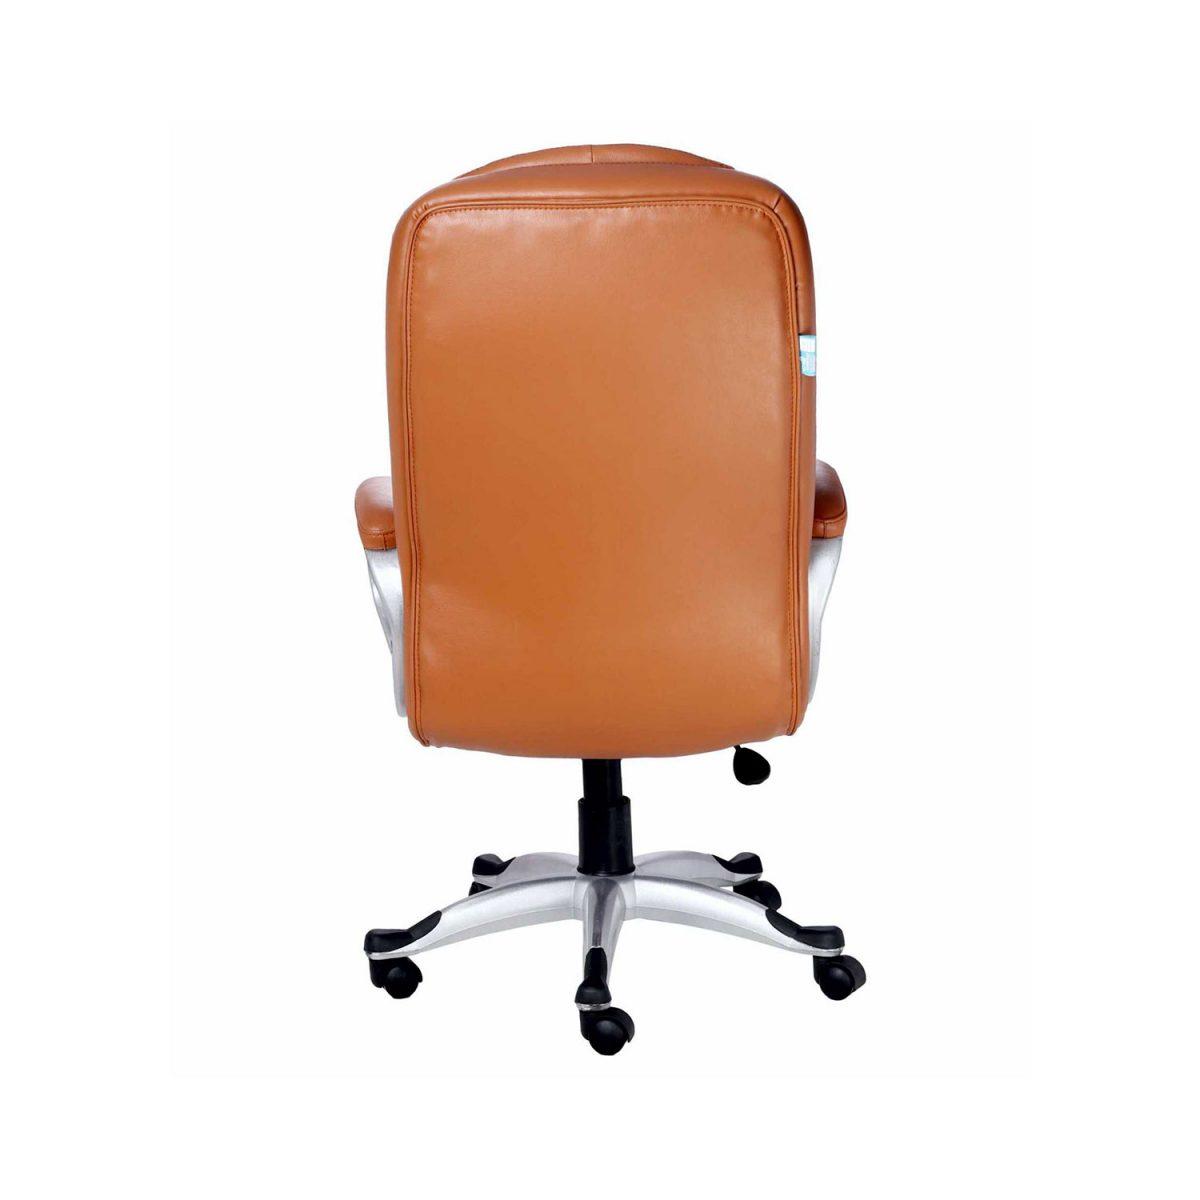 The Helado Executive High Back Chair In Tan Color